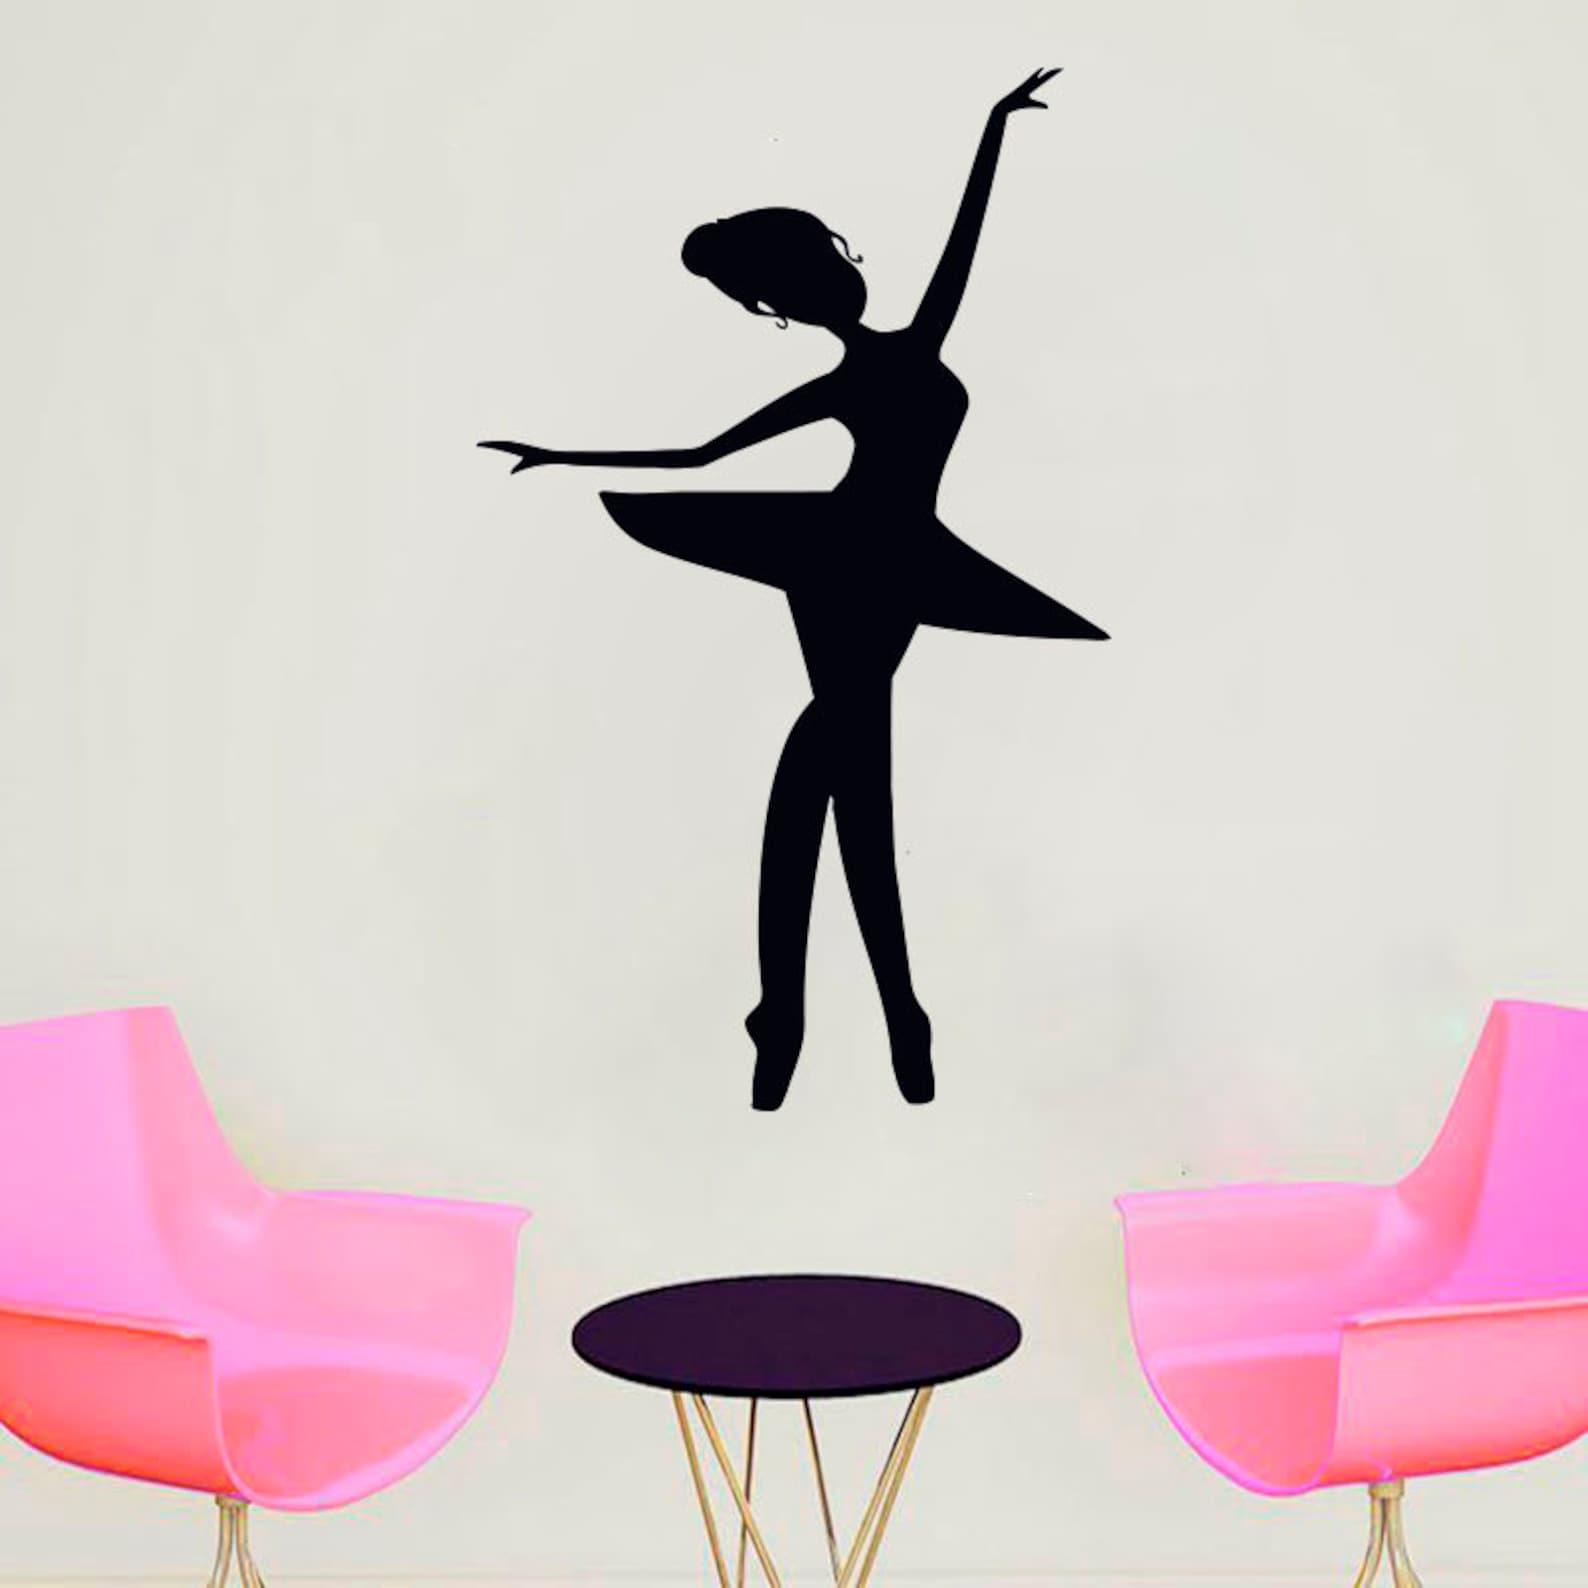 ballet, dance, ballet tutu, pointe shoes, ballet school wall decal window sticker handmade z52